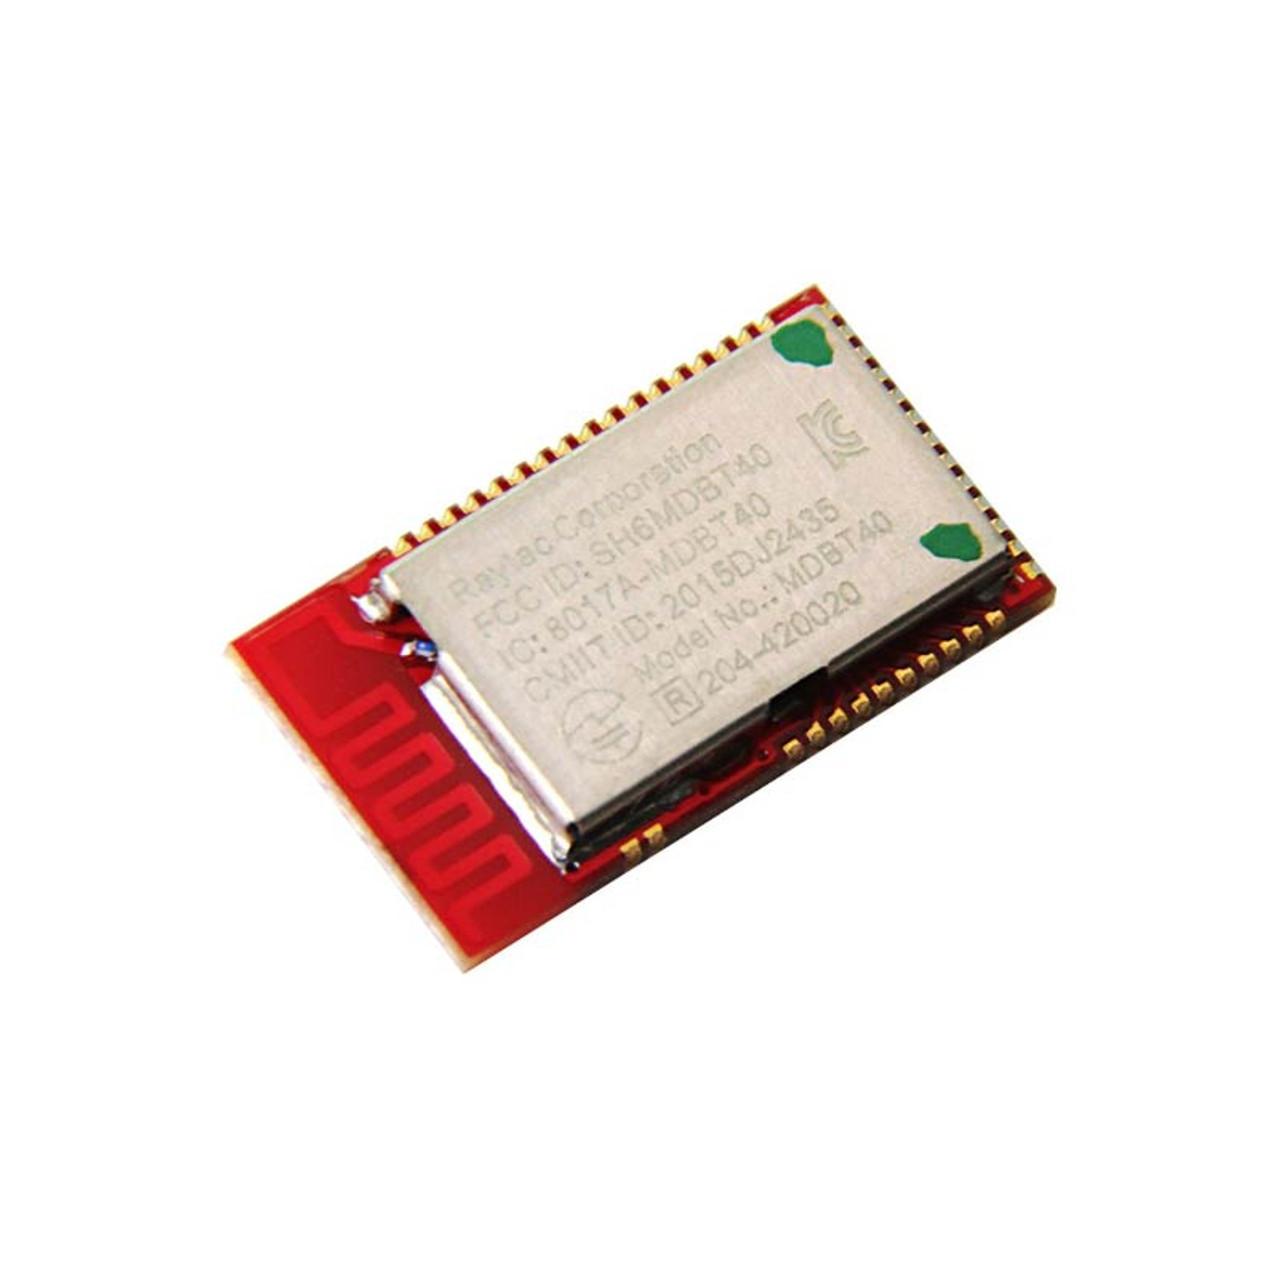 MDBT40-ANT-P256V3 Nordic nRF51422 Bluetooth Module - SeeedStudio